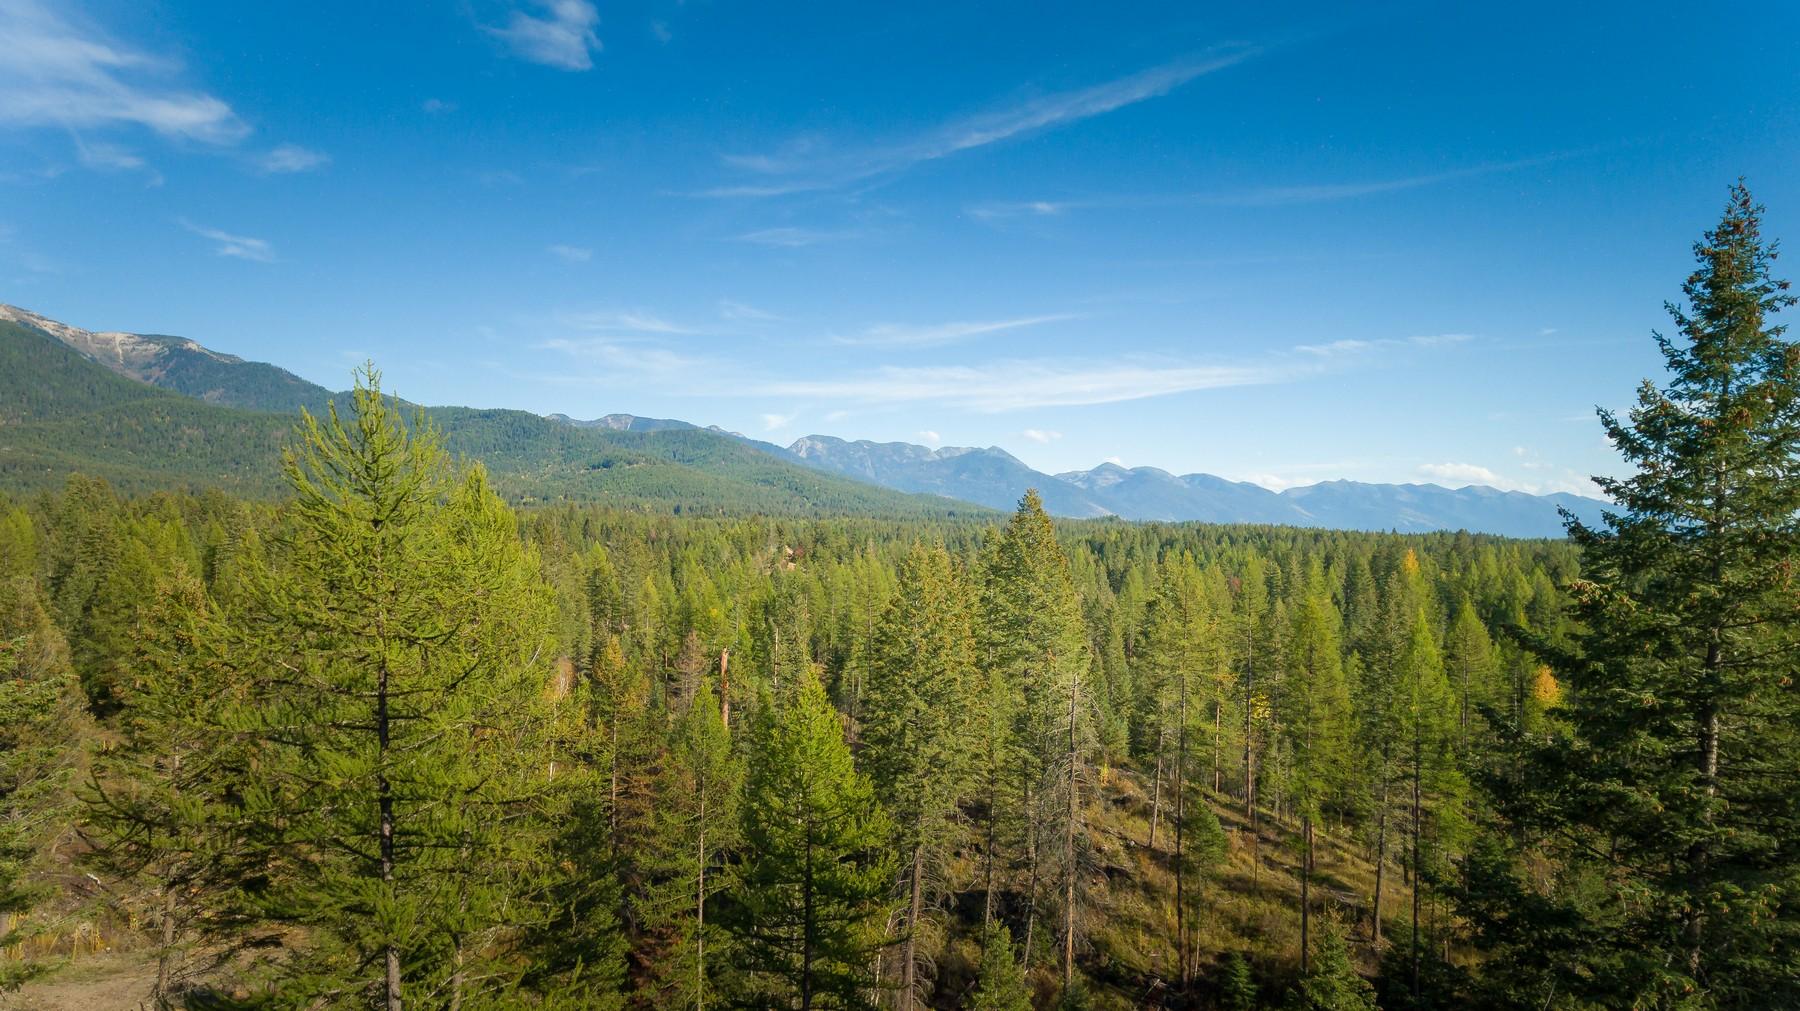 Terreno por un Venta en 395 Kauffman Ln , Kalispell, MT 59901 395 Kauffman Ln Kalispell, Montana, 59901 Estados Unidos